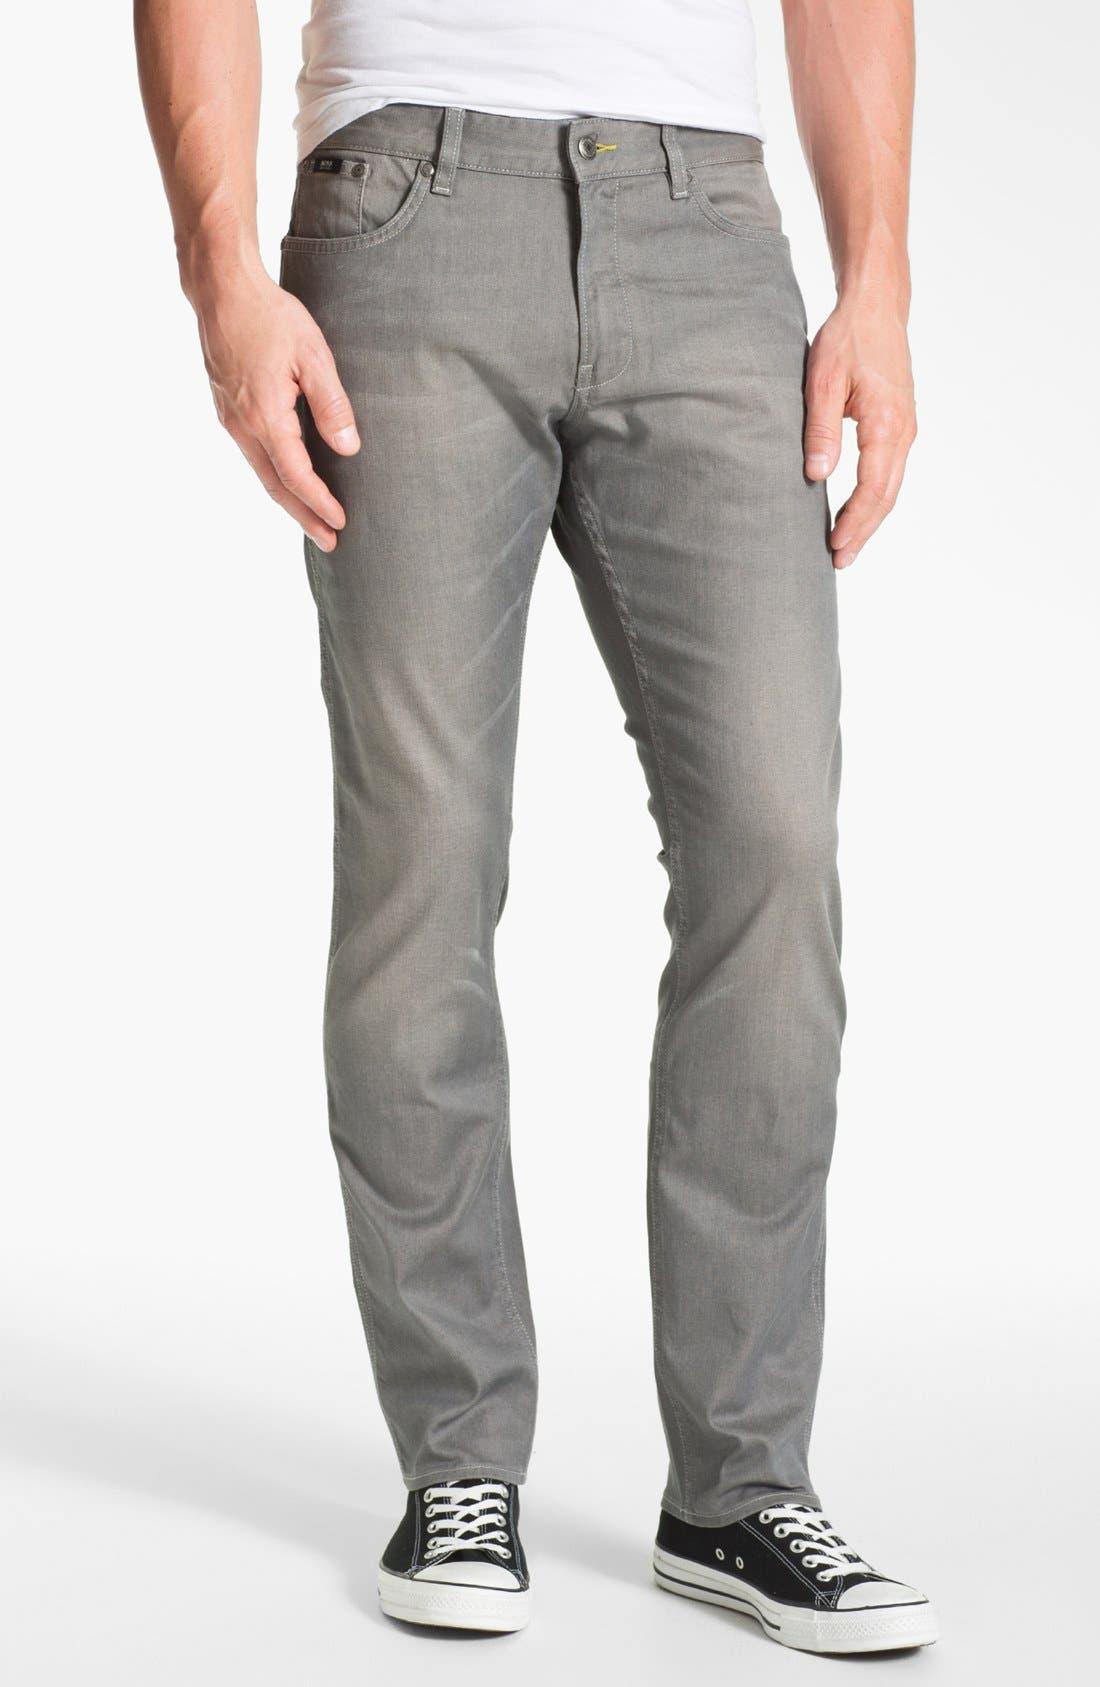 Alternate Image 1 Selected - BOSS HUGO BOSS 'Delaware' Slim Fit Jeans (Grey Denim)